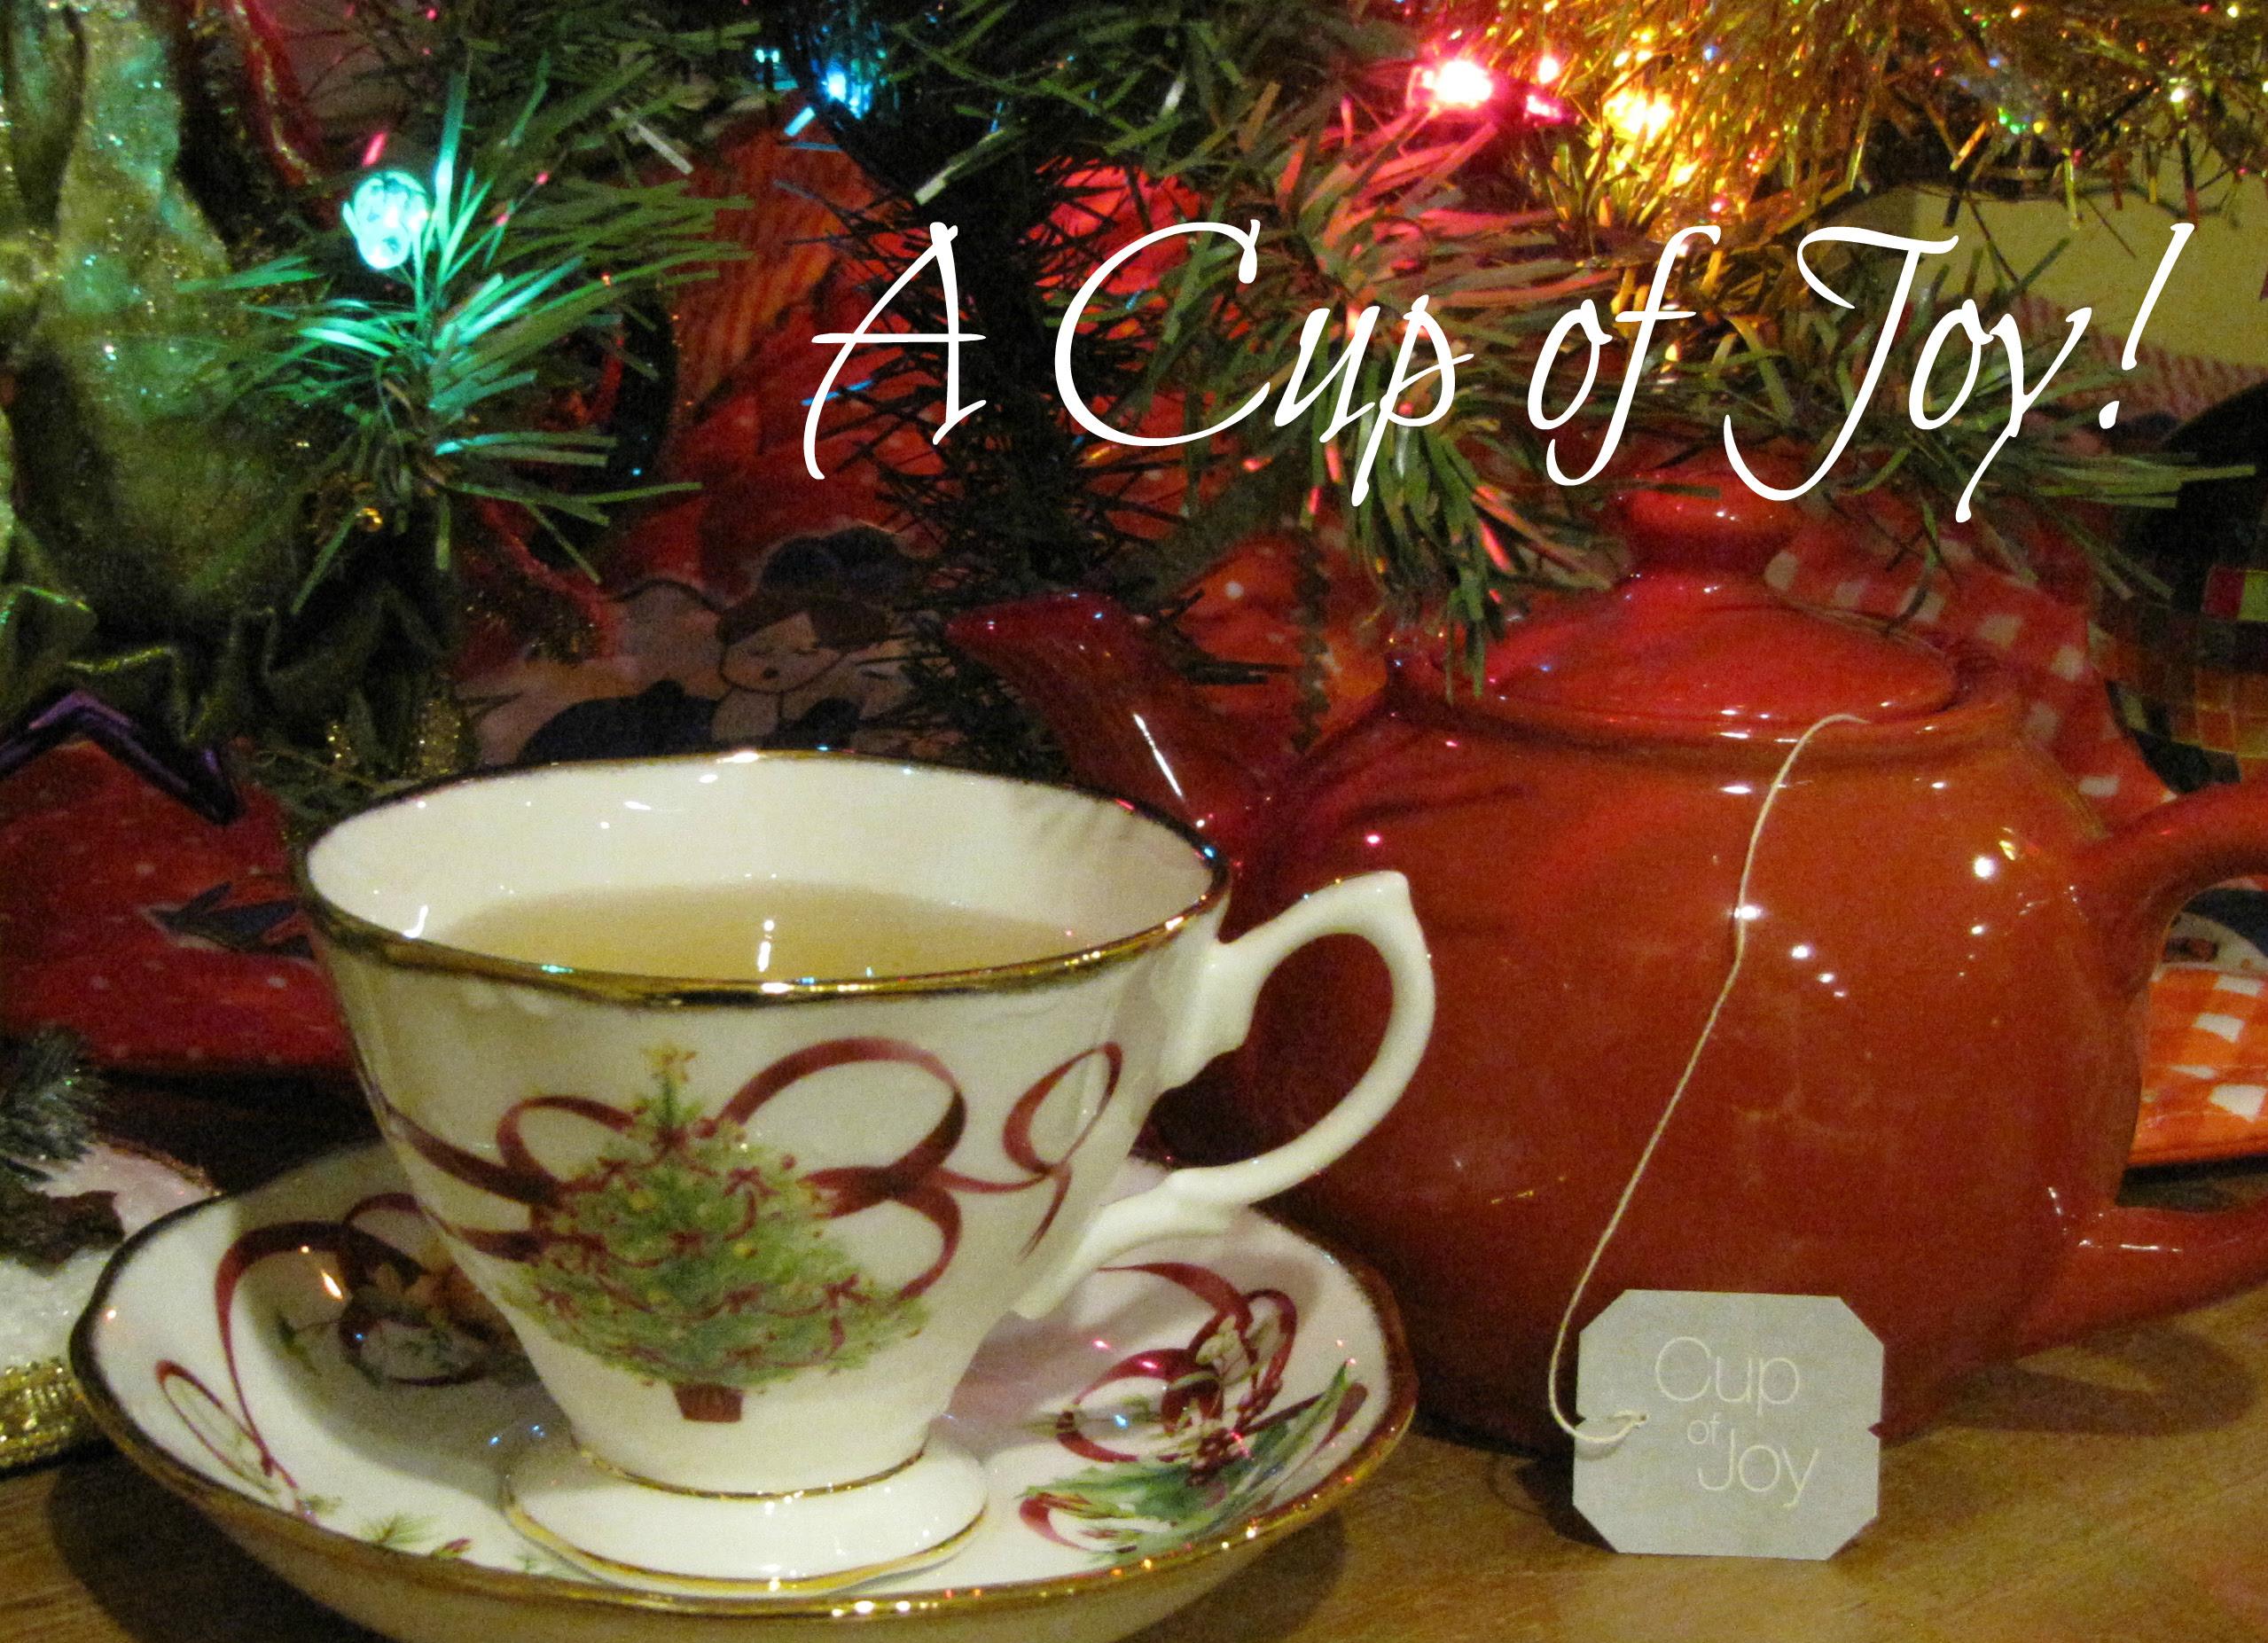 A Cup of Joy